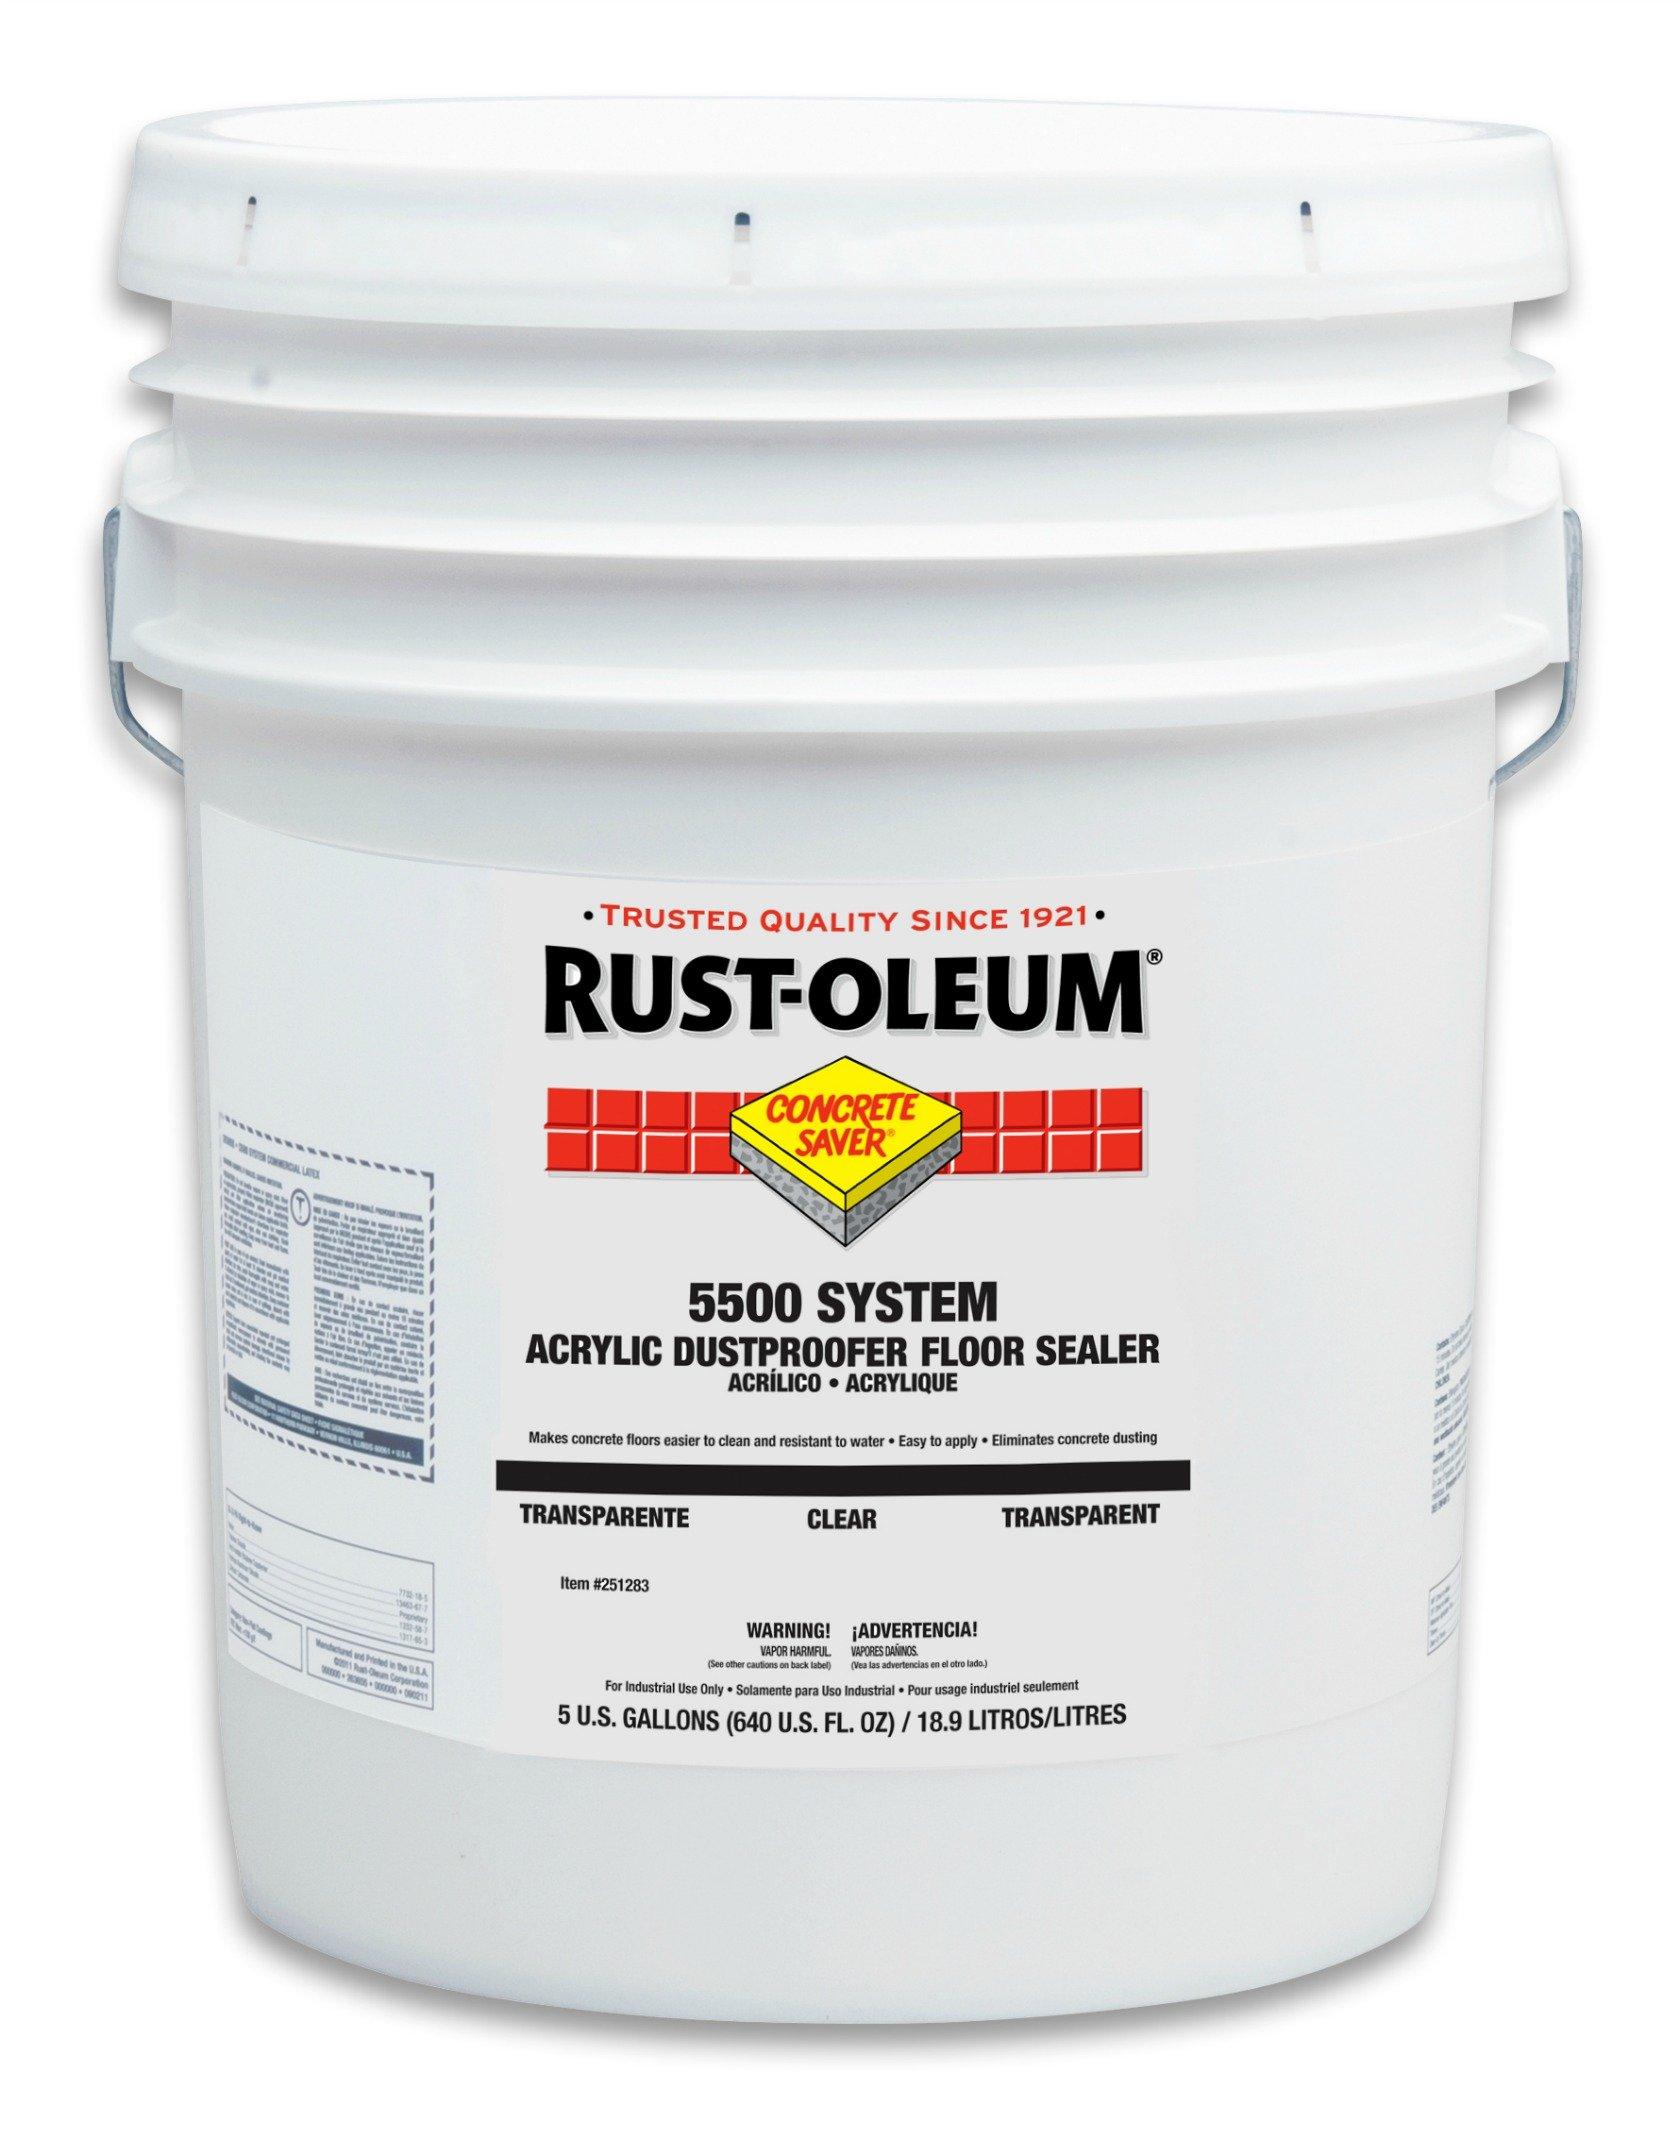 Rust-Oleum 251283 Concrete Saver 5500 System Acrylic Dust Proofer Floor Sealer, 5-Gallon, Clear